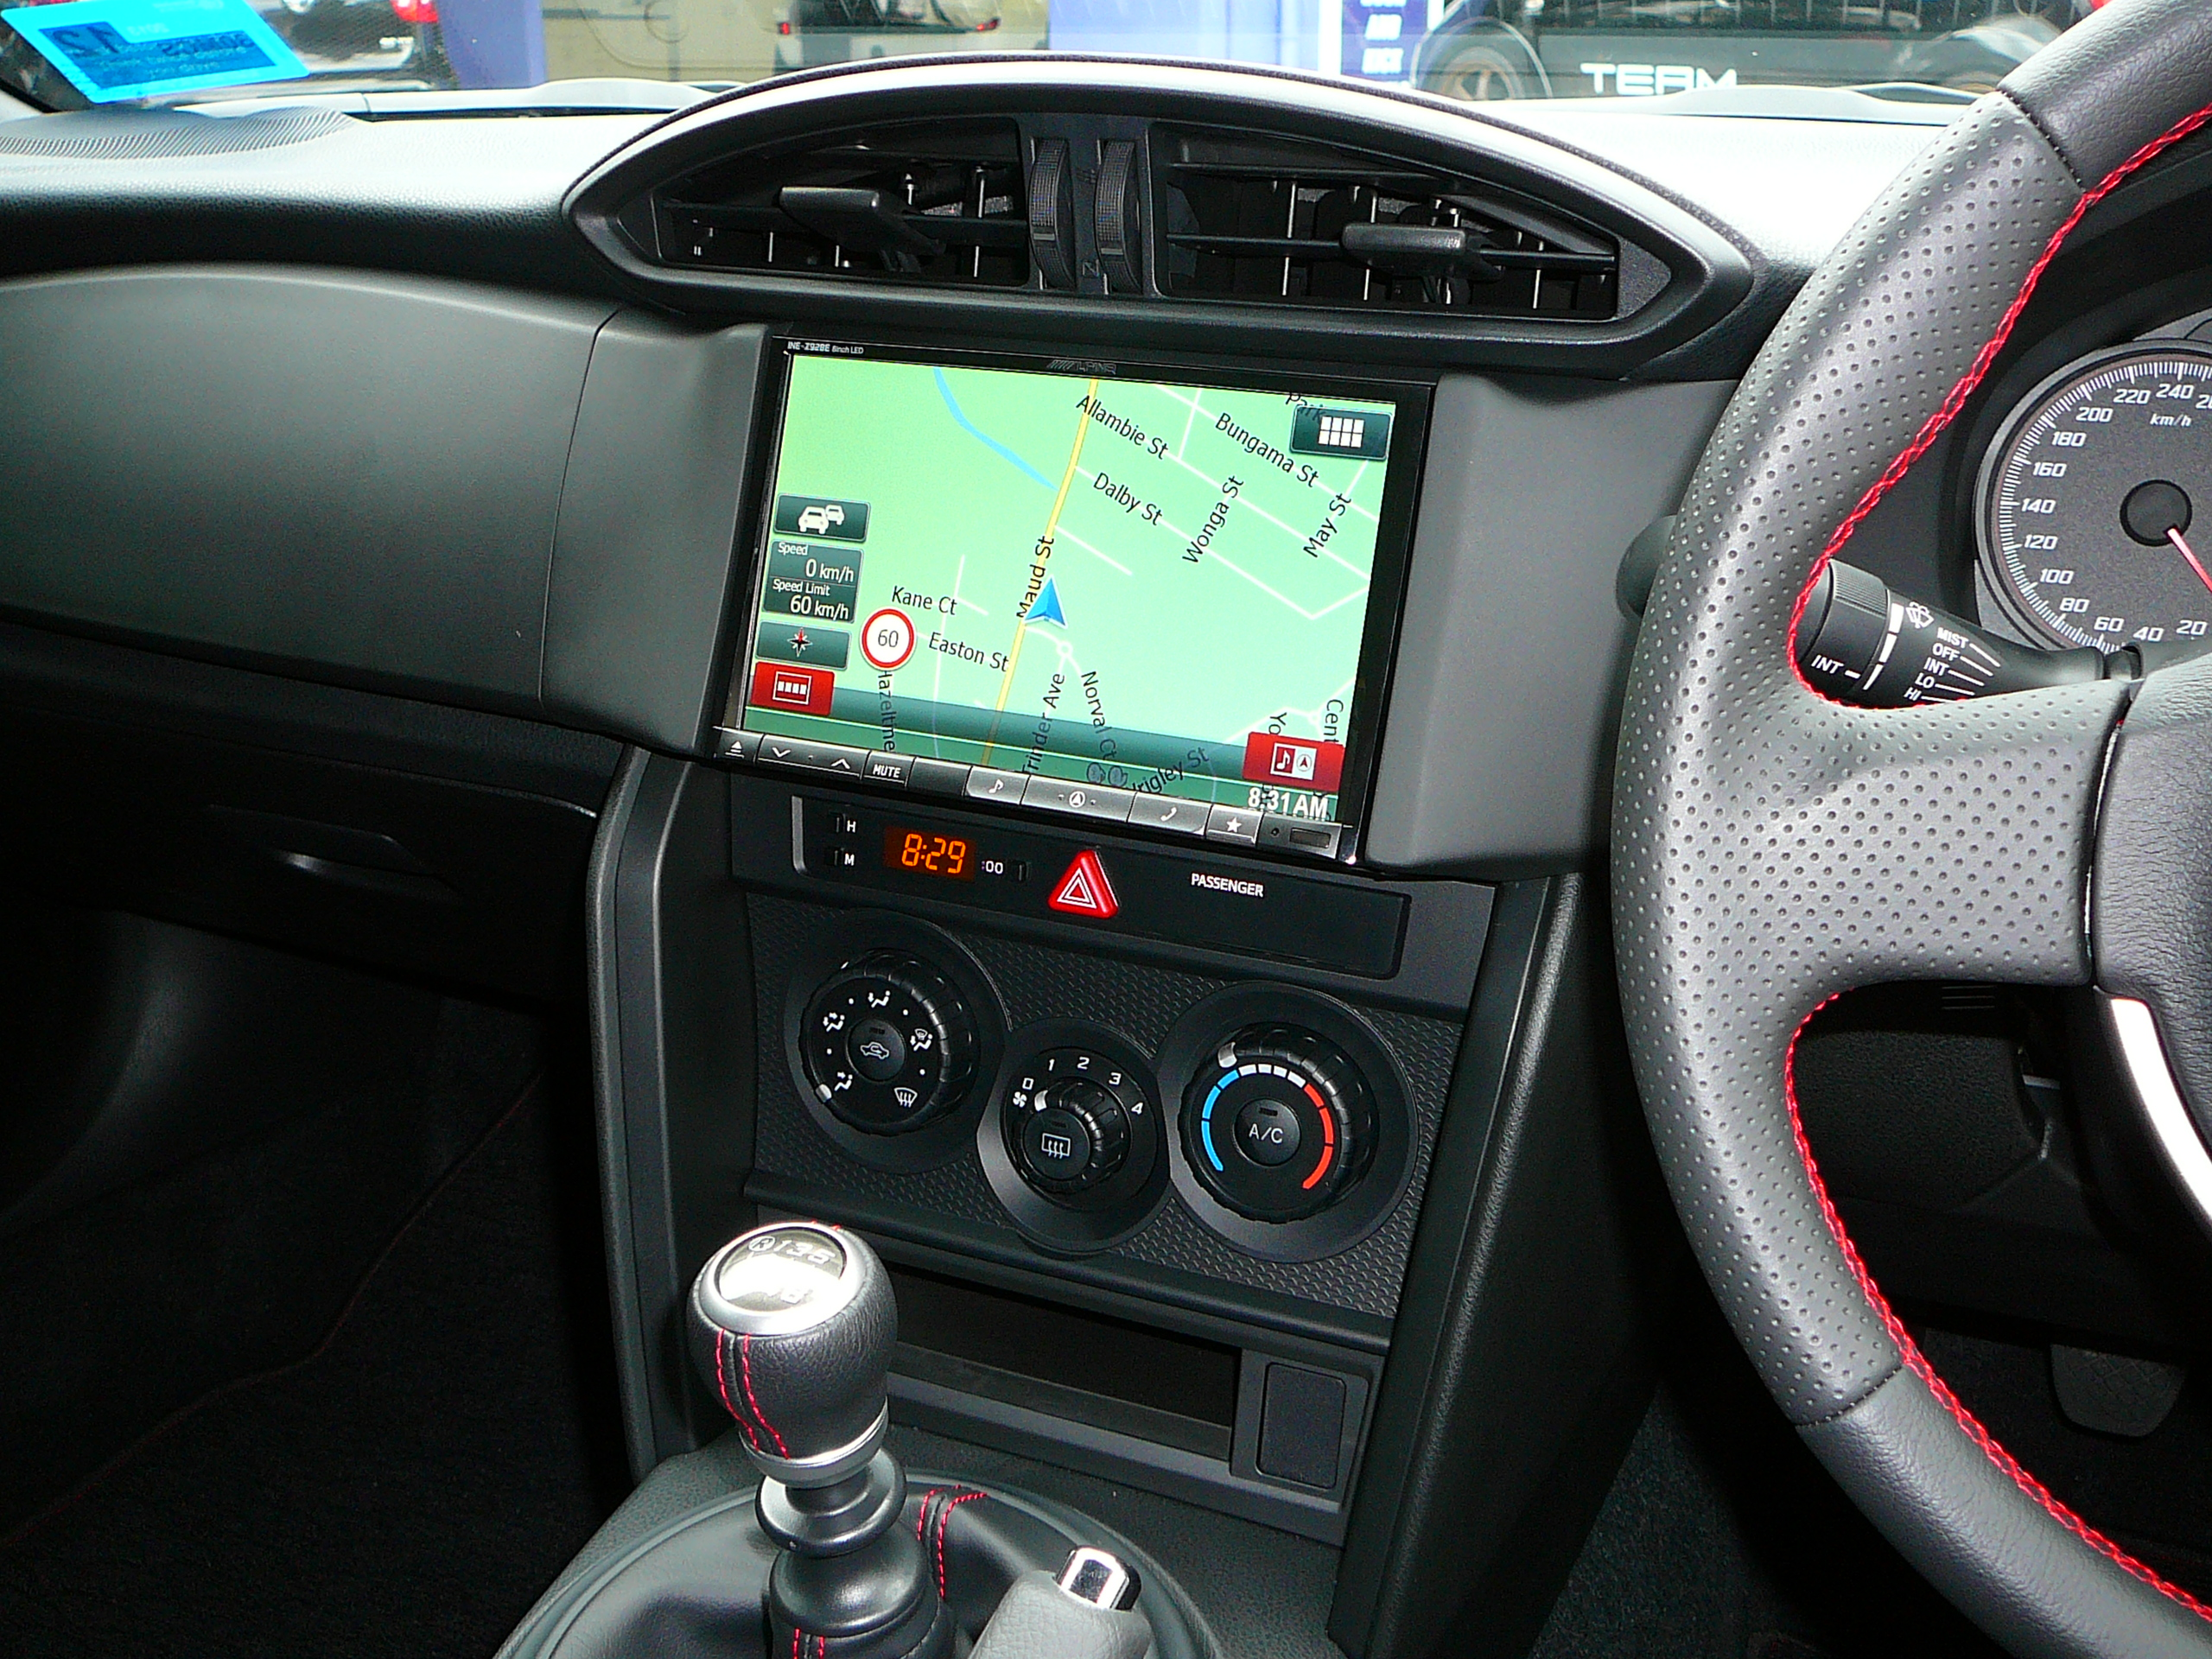 Toyota 86 – Alpine INE-Z928E In-dash GPS Navigation Unit